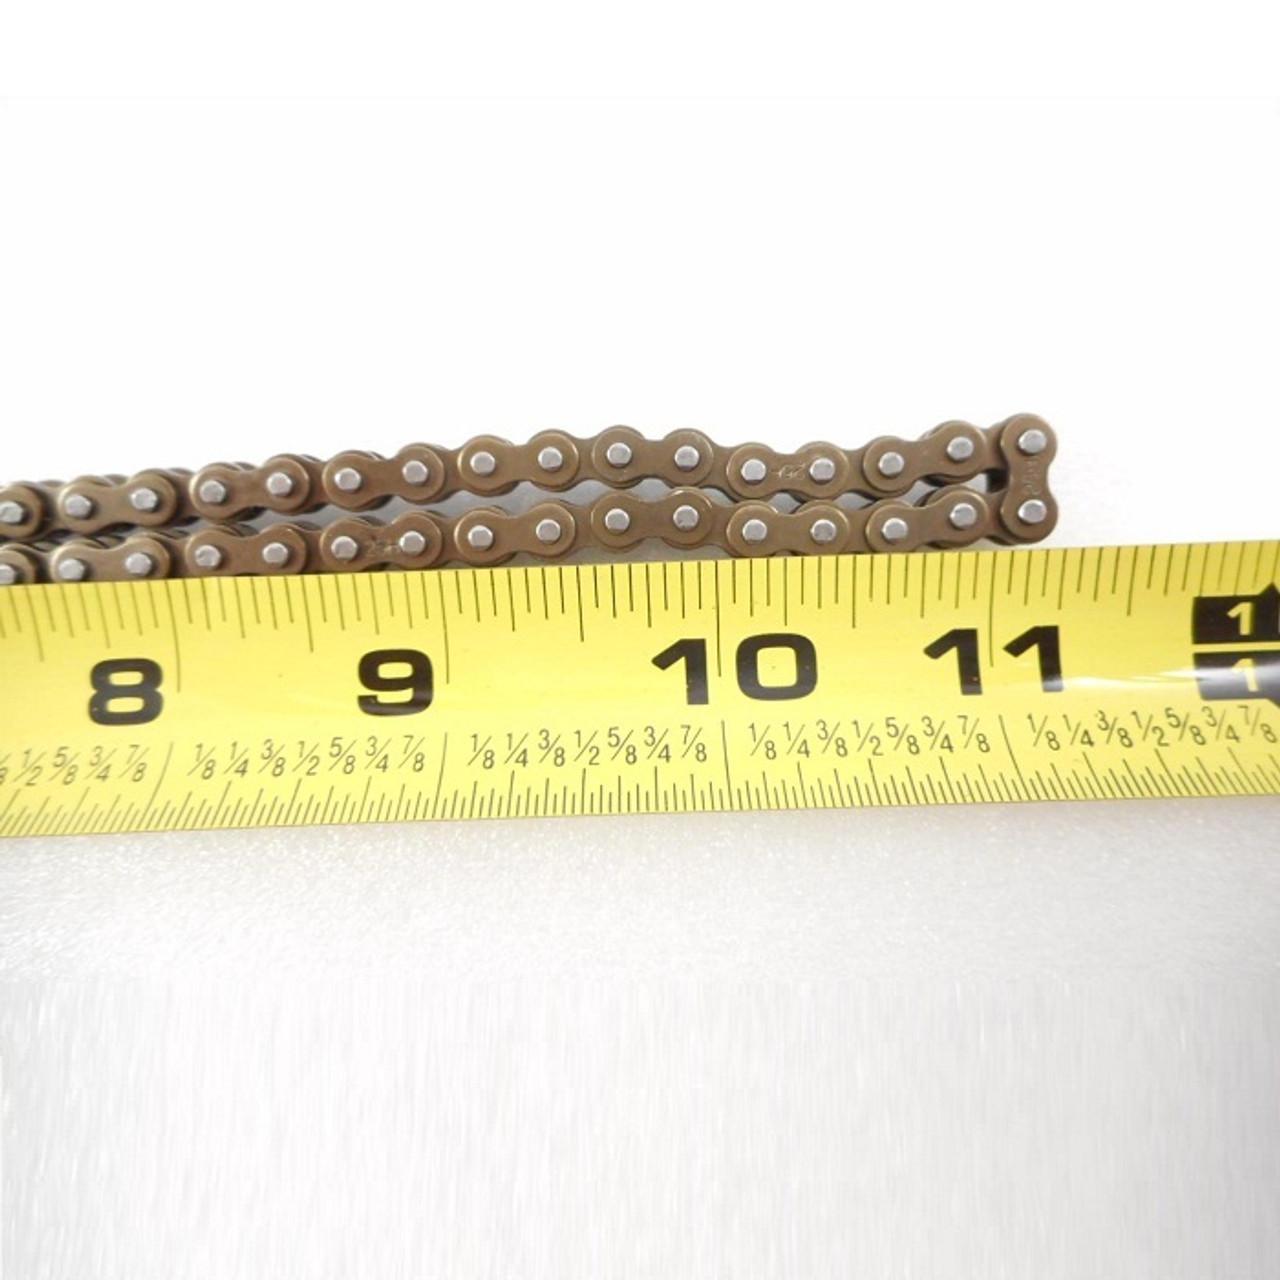 Timing Chain 84 Links for ATA 110 B/B1 103739